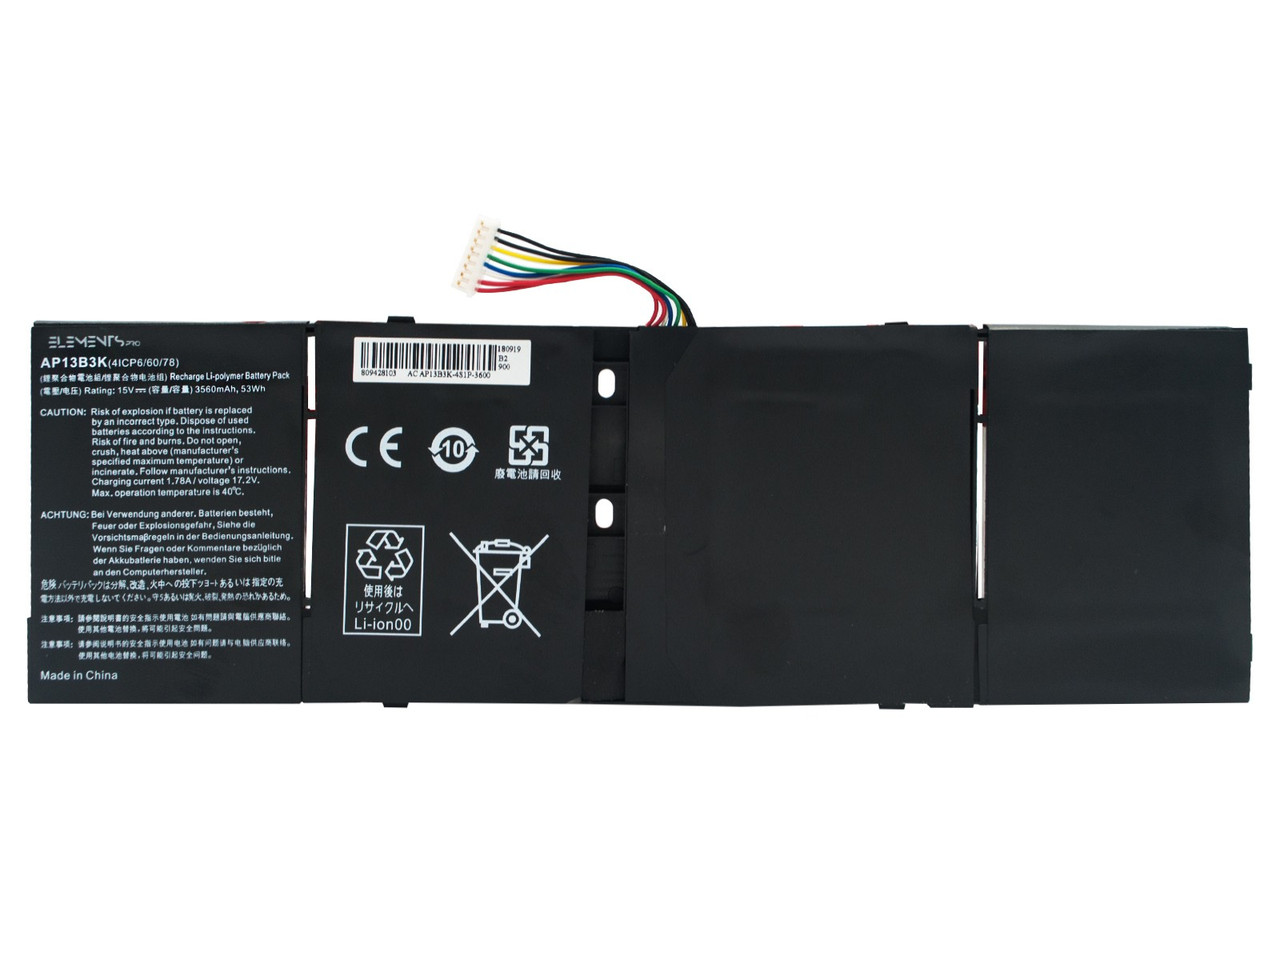 Батарея Elements PRO для Acer Aspire M5-583P R7-571 R7-572 V5-472 V5-473 V5-552 V5-572 V5-573 15V 3560mAh (AP13B3K-4S1P-3600)